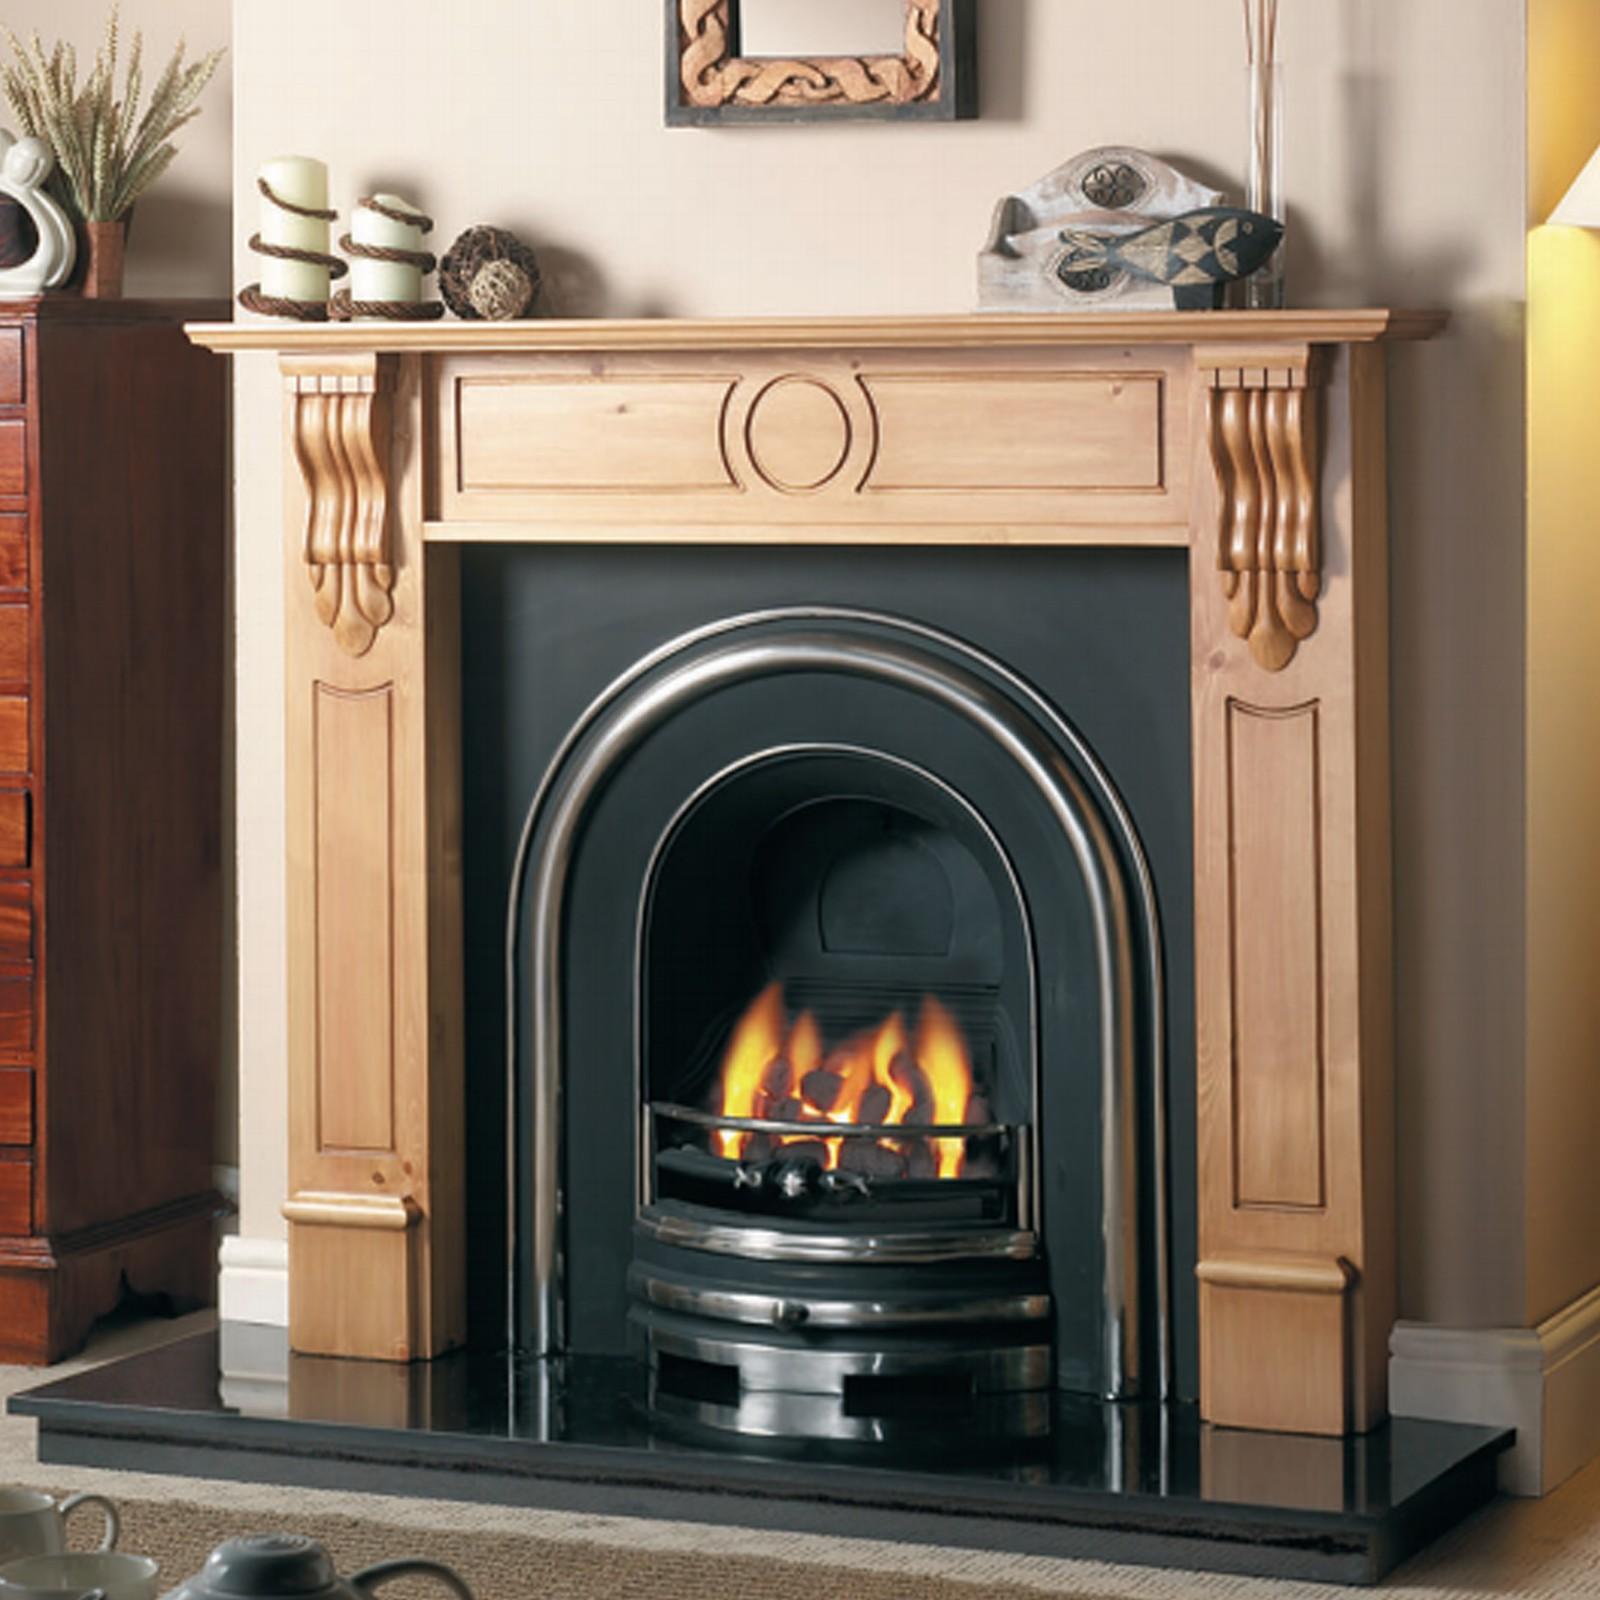 Cast Tec Royal Arch Cast Iron Fireplace Insert